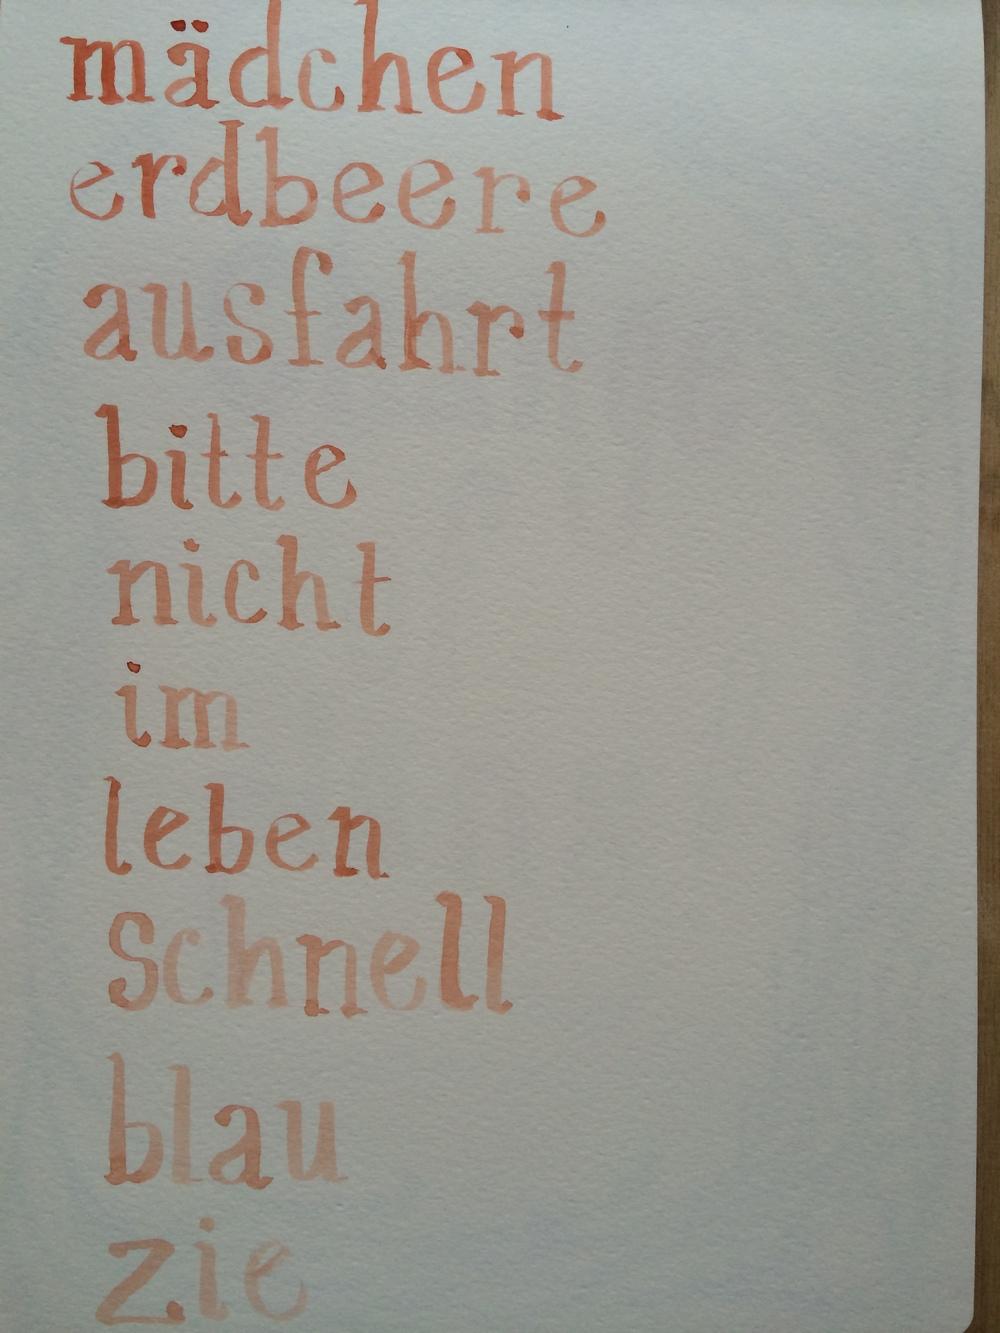 8/4/14 German words I know